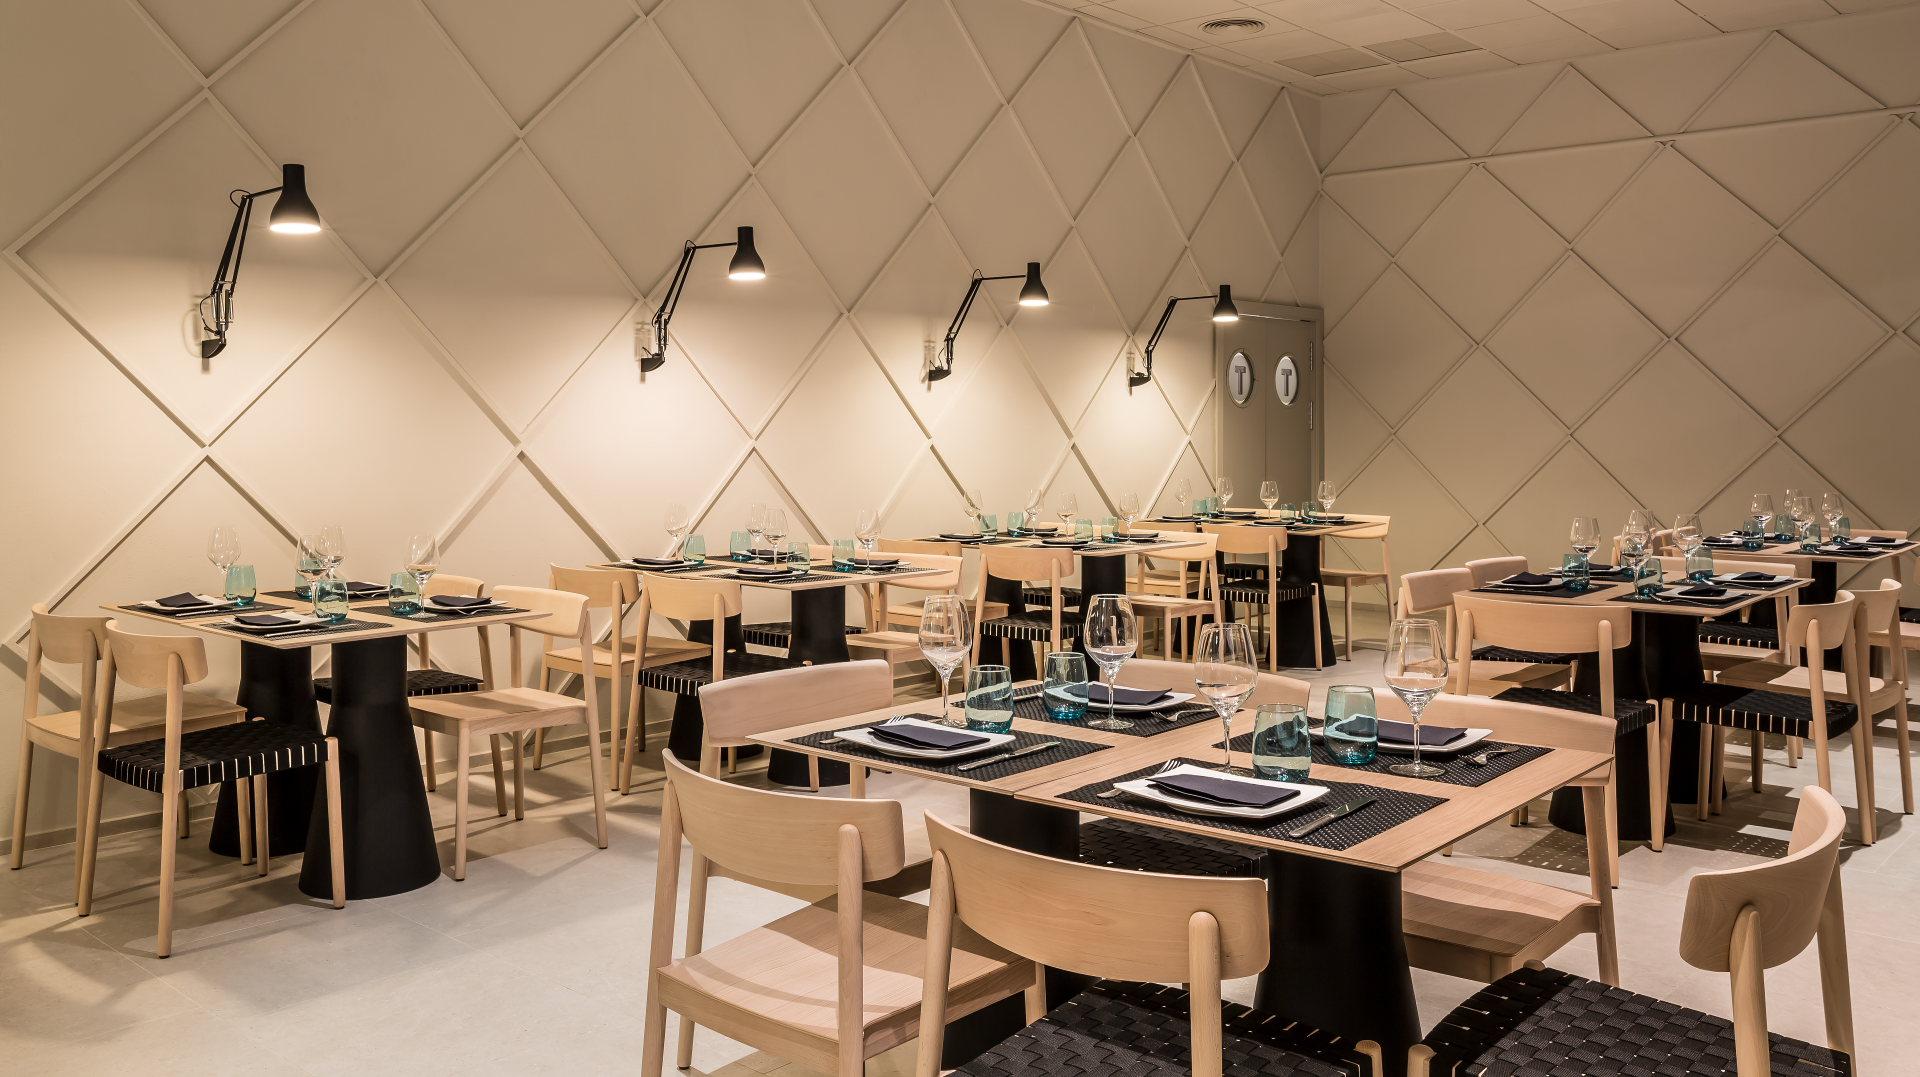 fotografia-arquitectura–interiorismo-valencia-german-cabo-estudihac-restaurante-tipics-xativa (19)